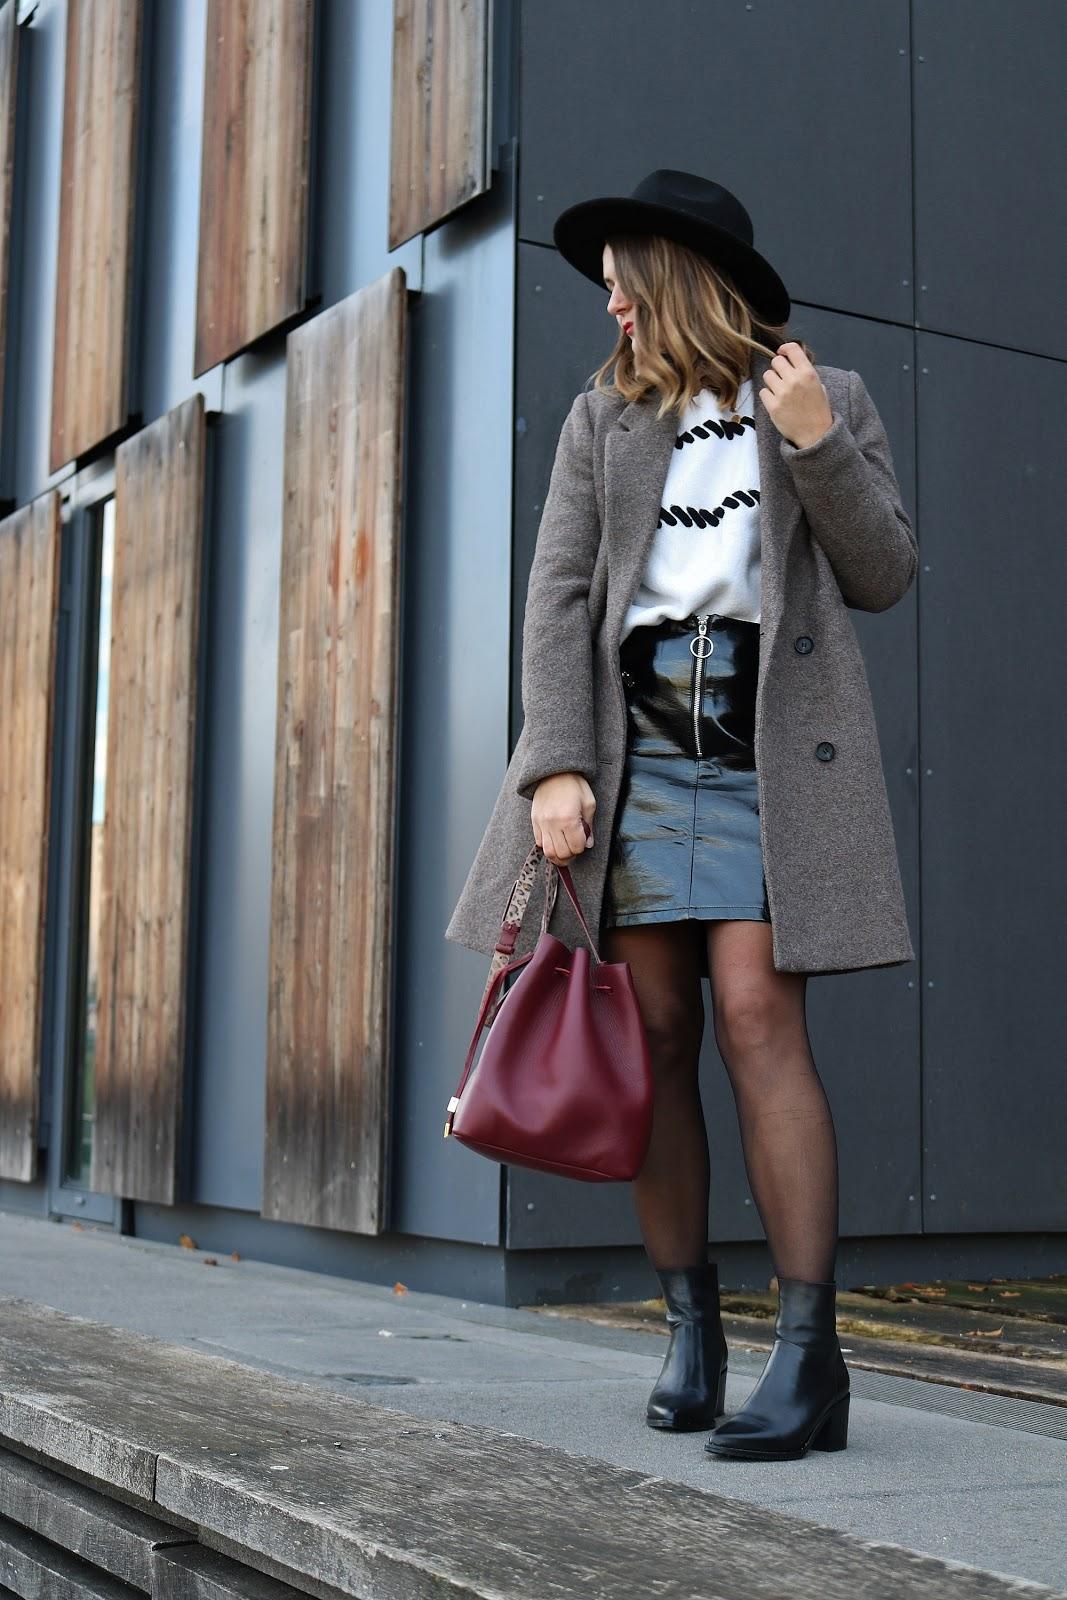 pauline-dress-look-besançon-mantea-marron-pull-blanc-beige-boucles-jupe-vinyle-bottines-jonak-sac-bordeaux